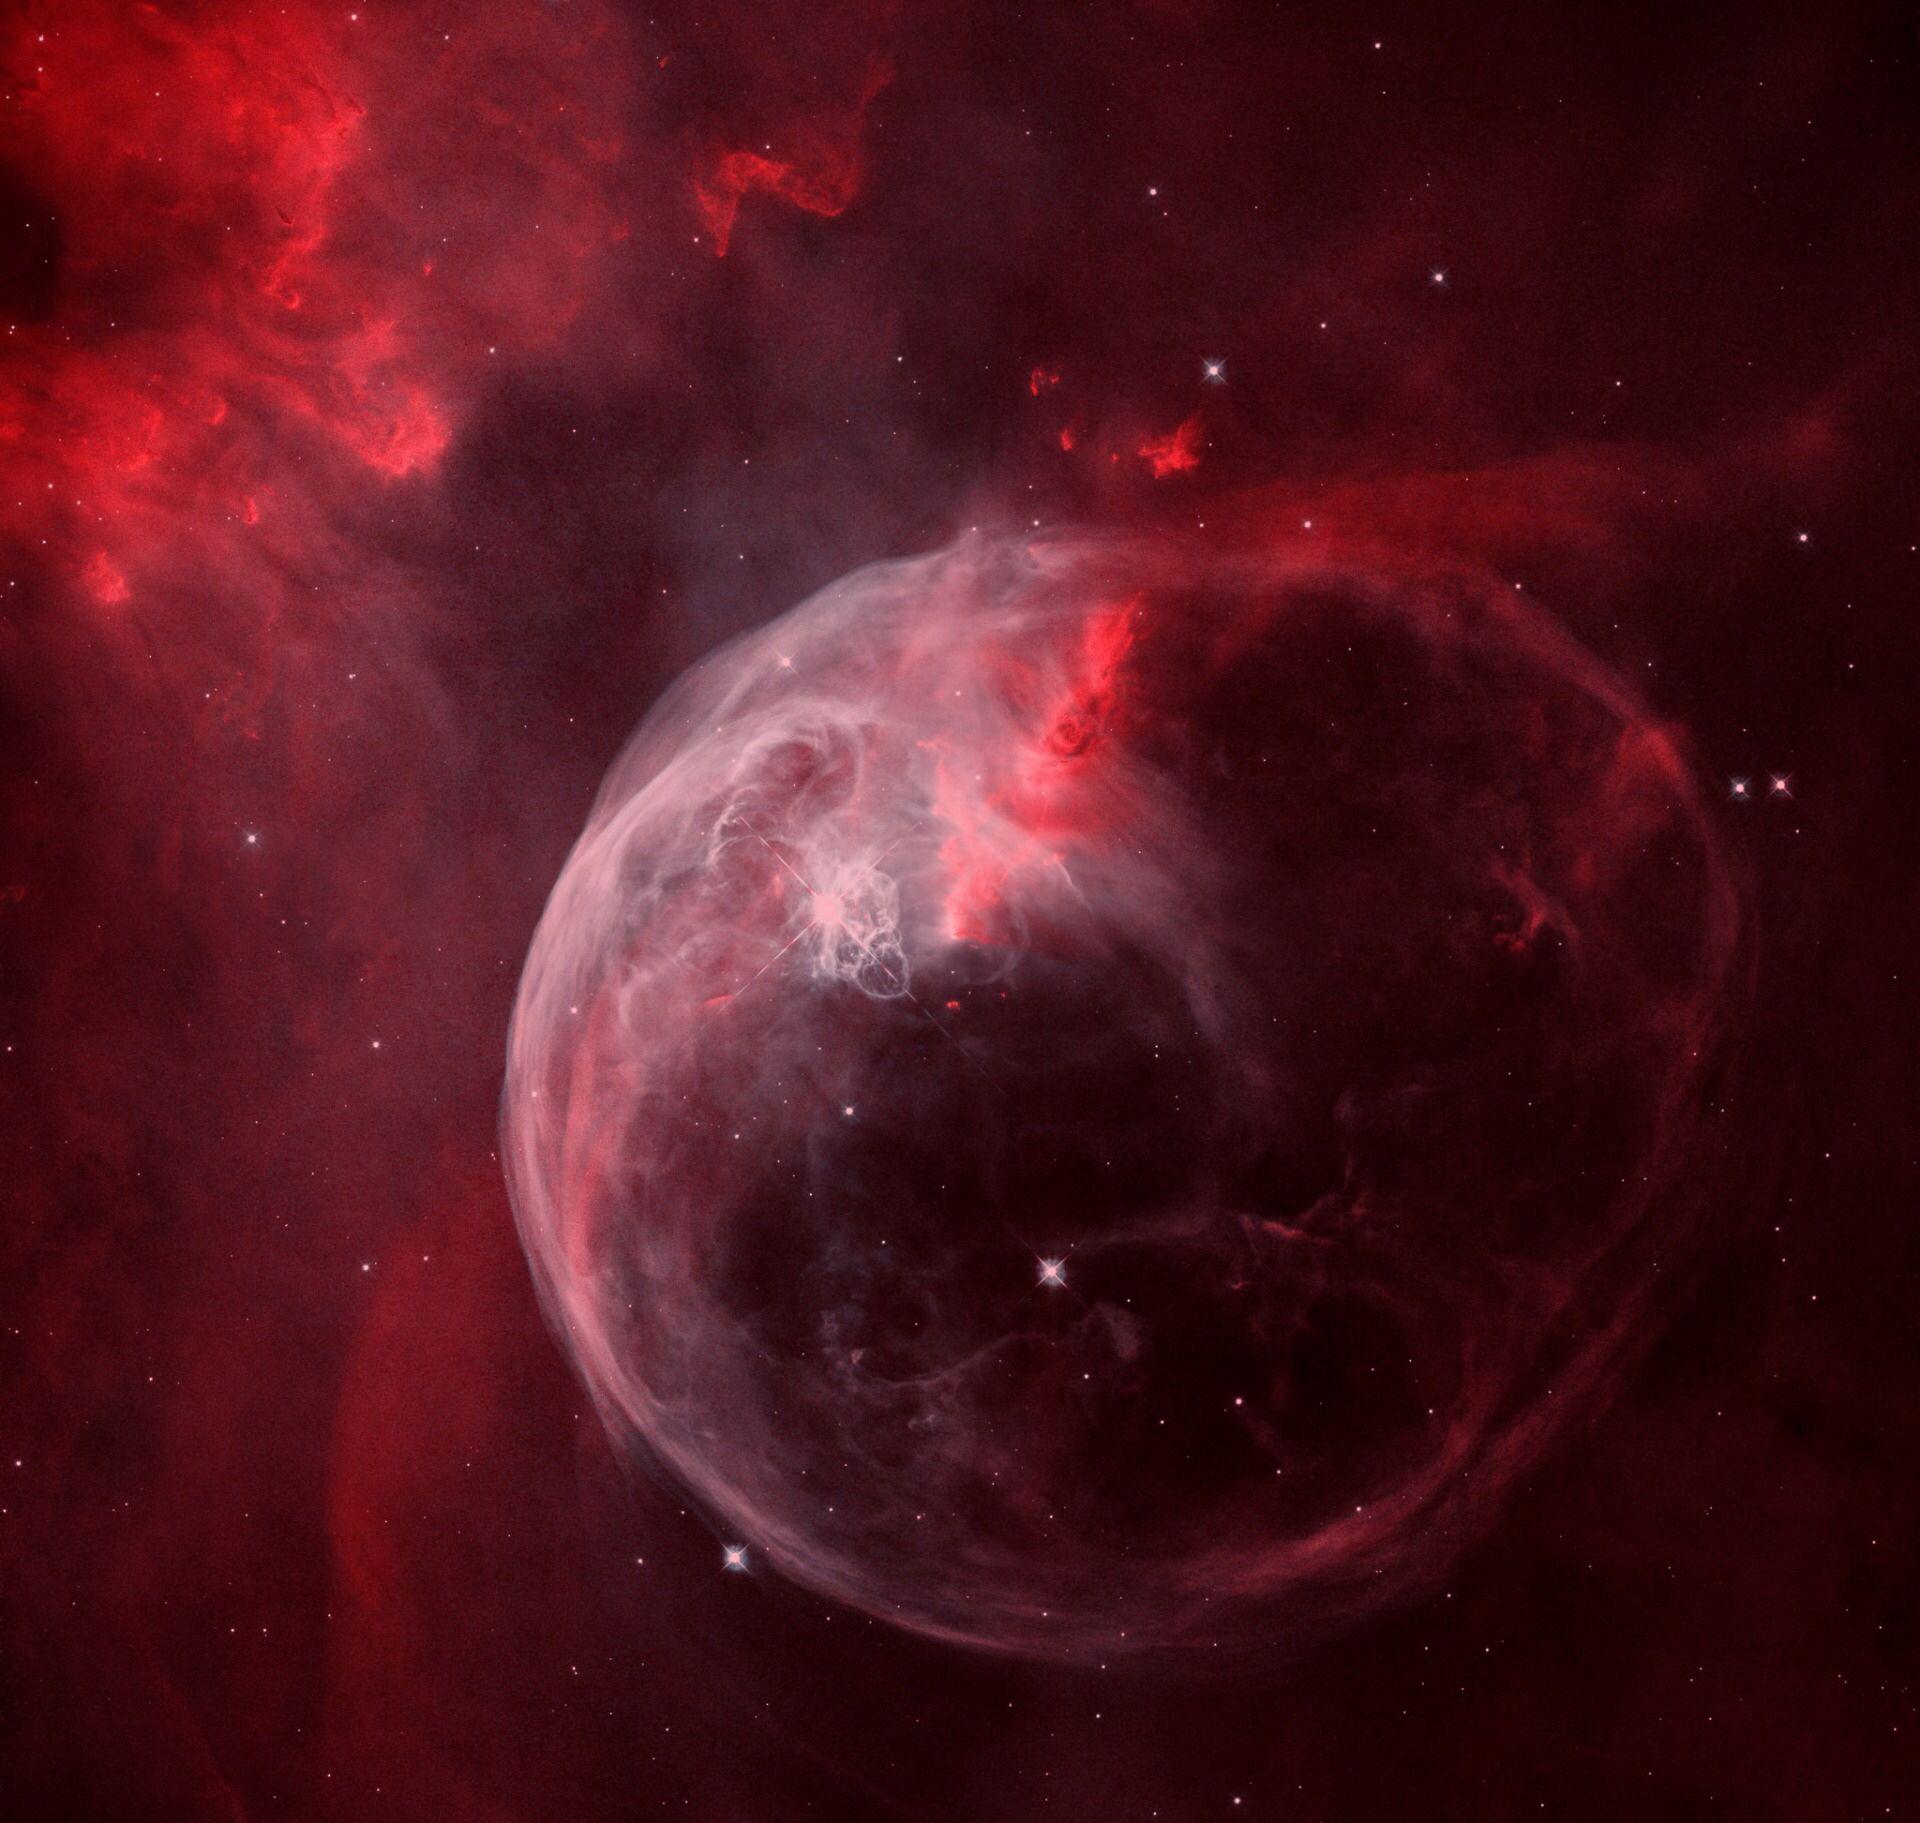 'NGC 7635: The Bubble Nebula' image from the #NASA_App ...